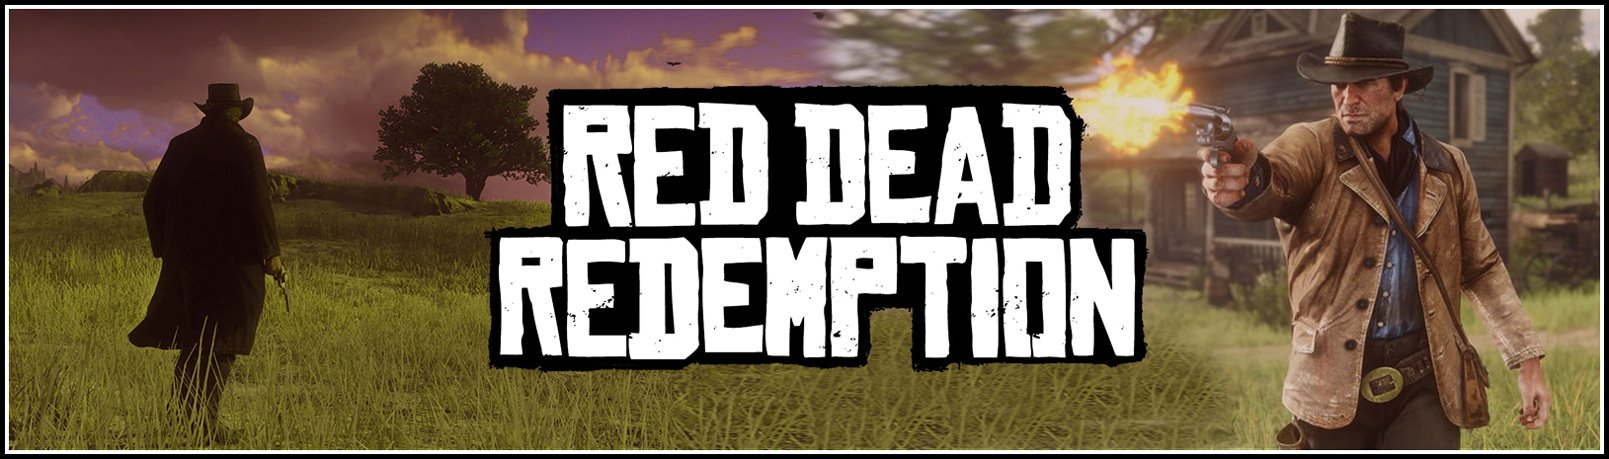 red dead redemption shop